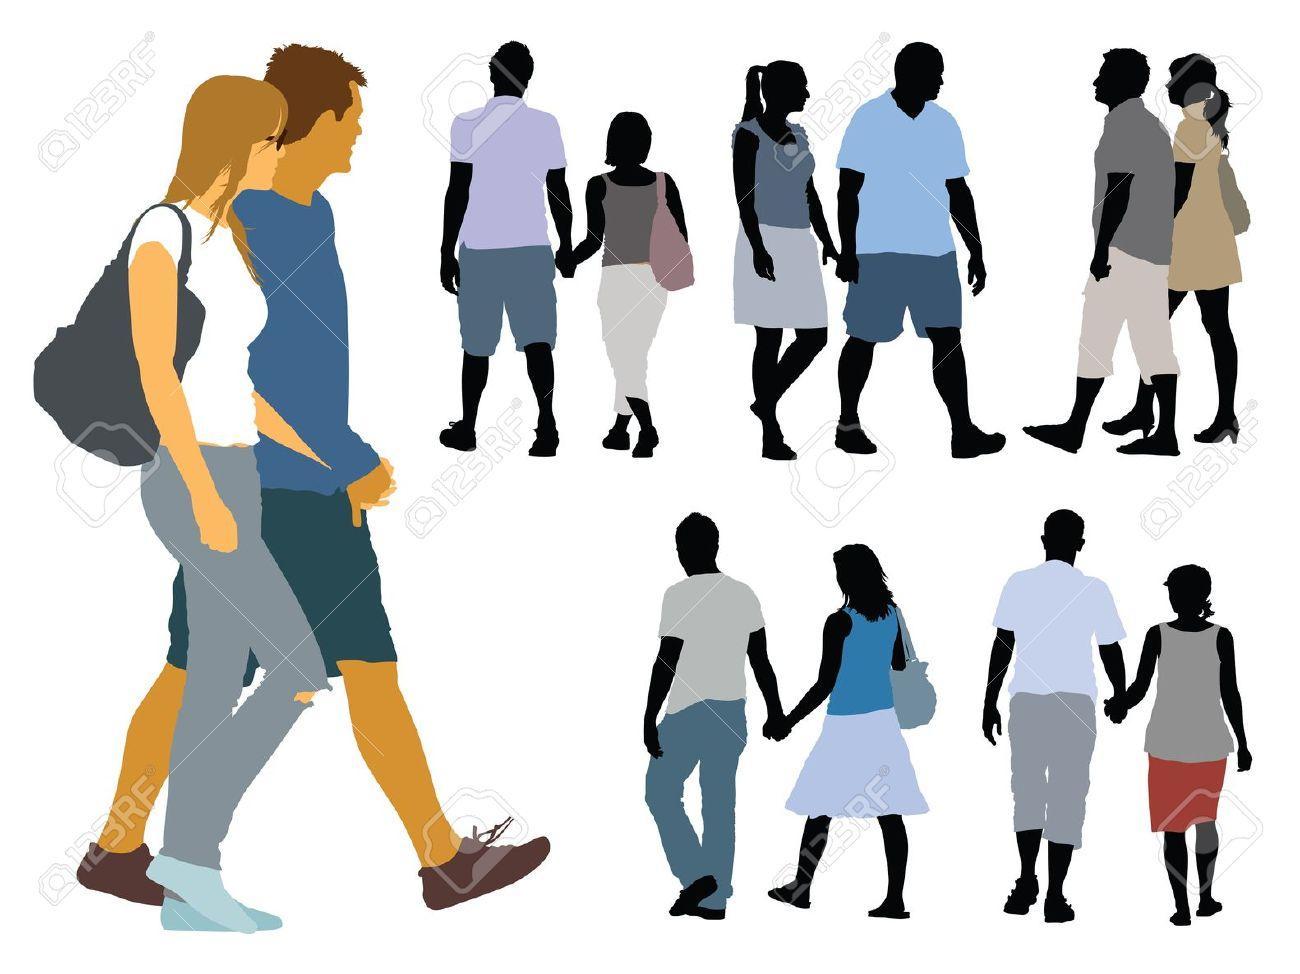 1300x974 Crowd Of People Walking Silhouette. Latest People Walking Black